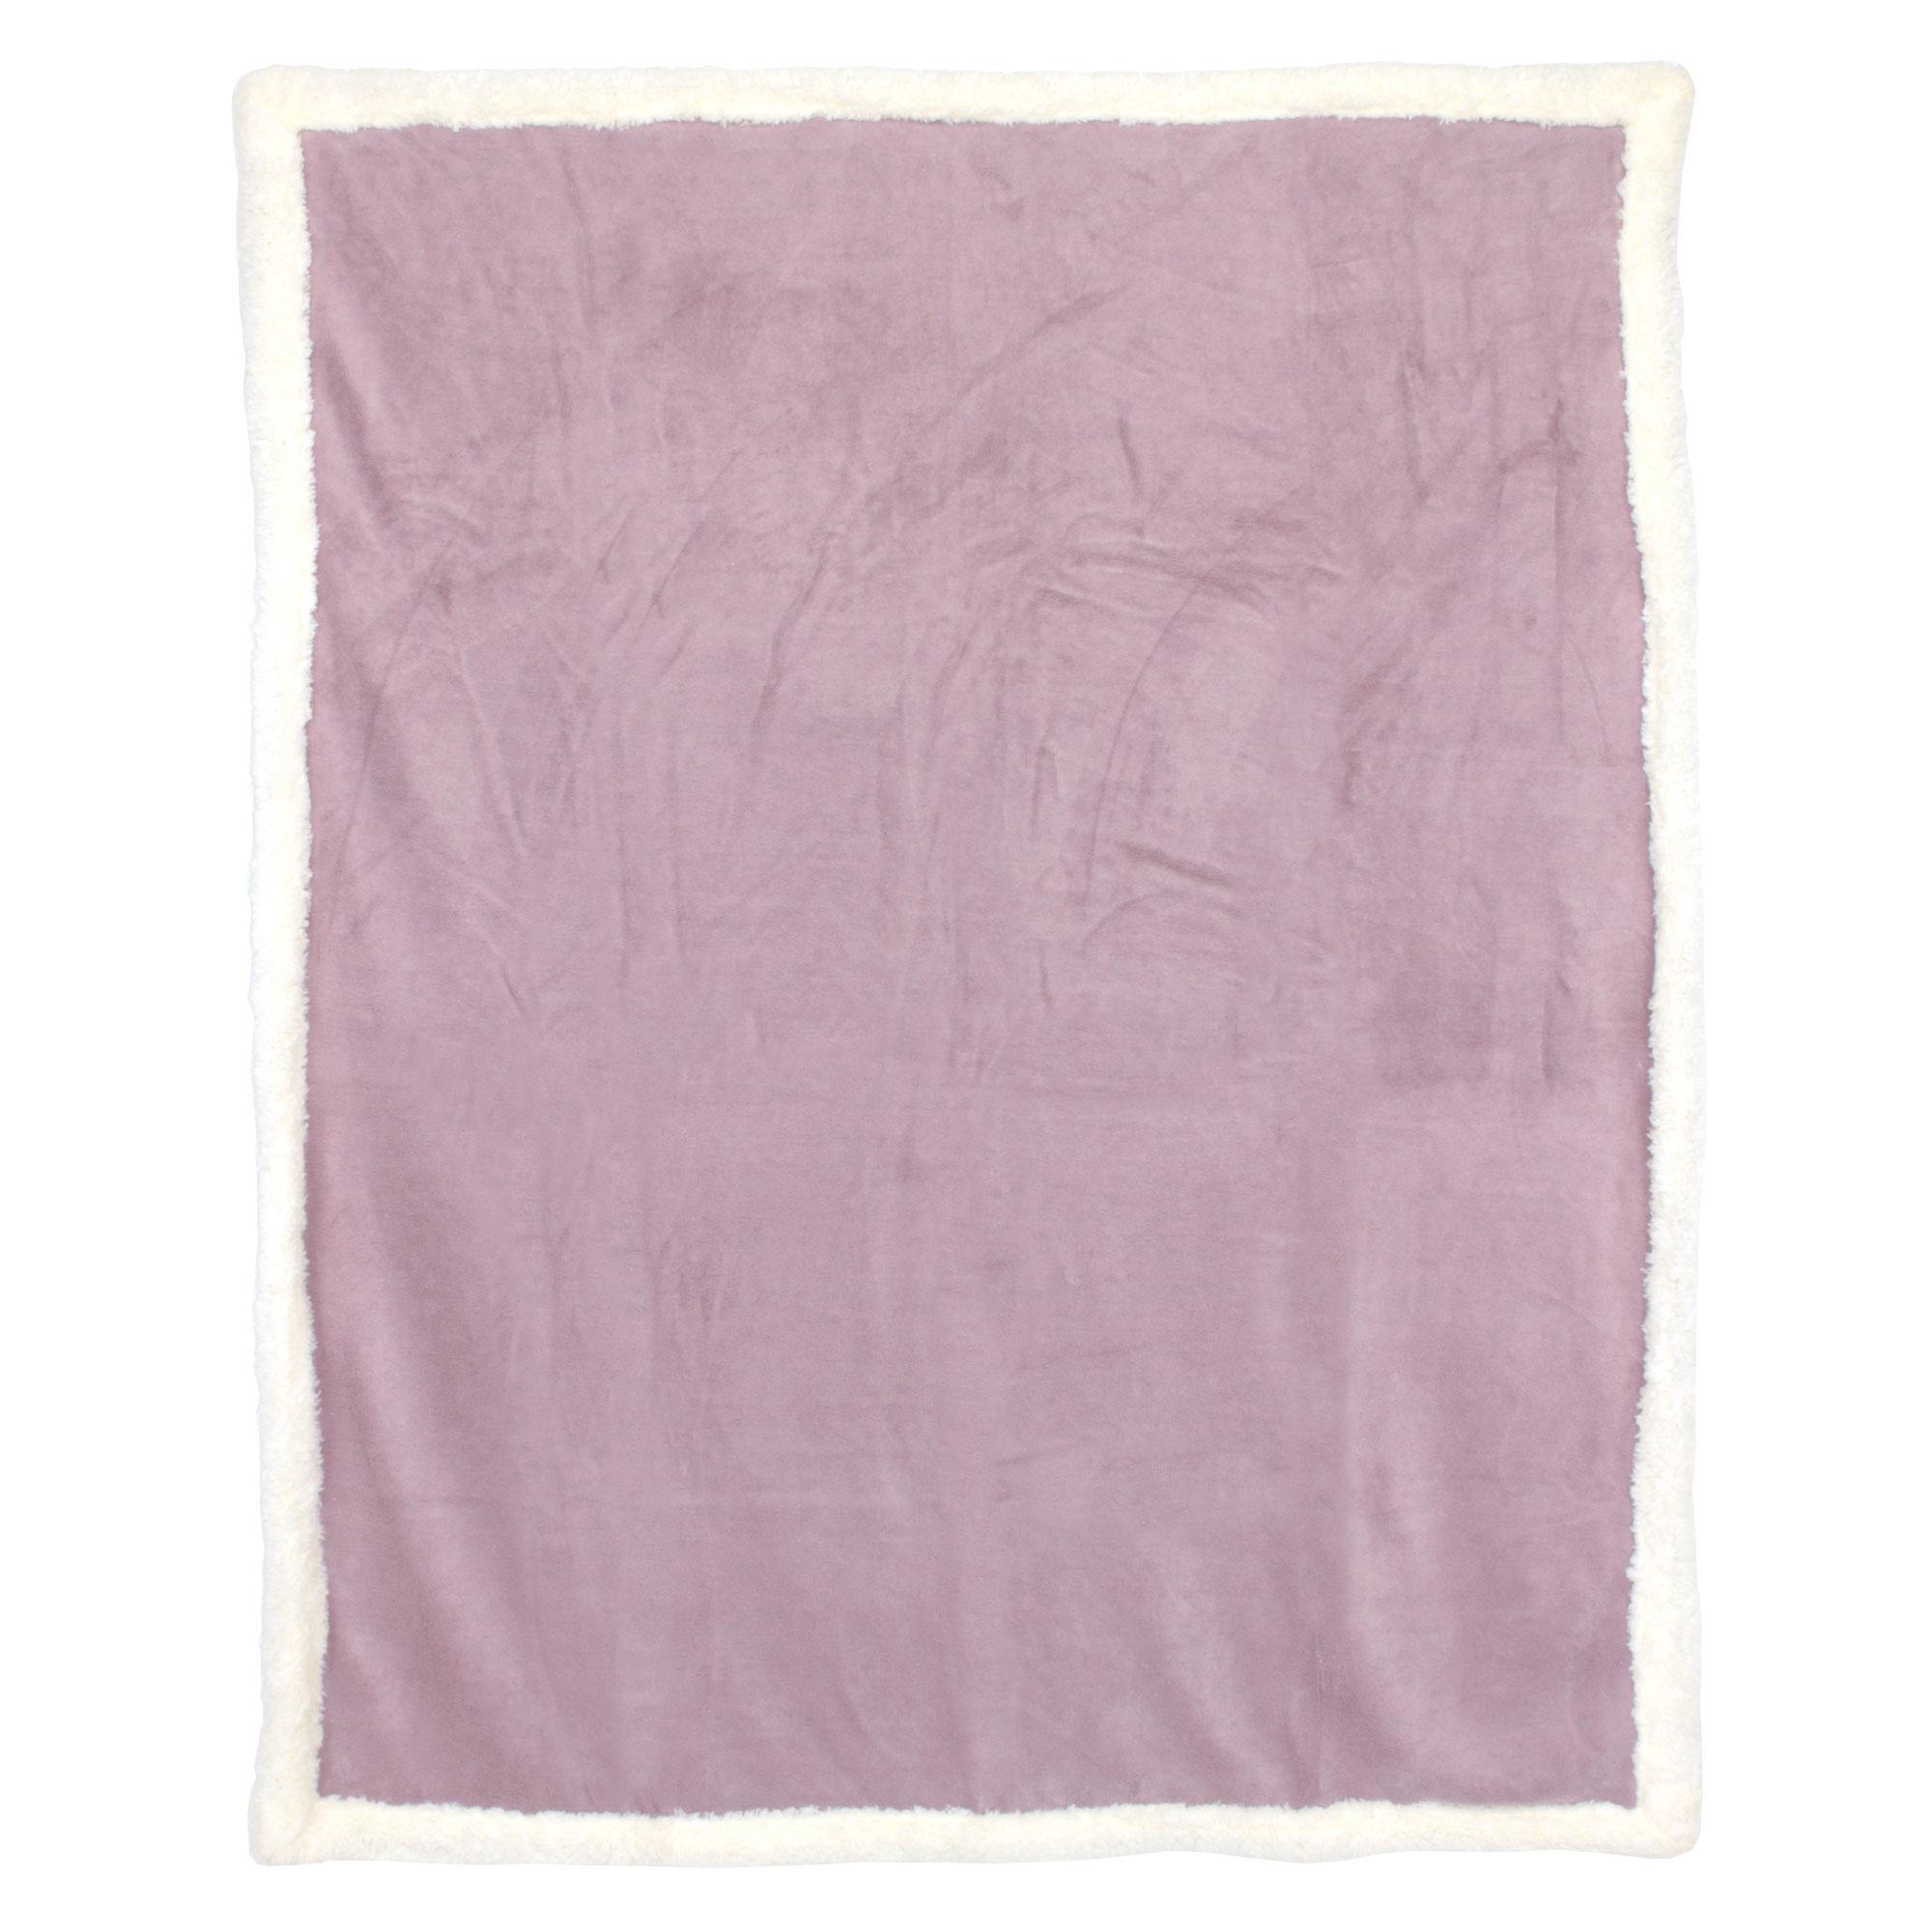 plaid hiver 130x150 polyester 490g m arthur rose poudre ebay. Black Bedroom Furniture Sets. Home Design Ideas